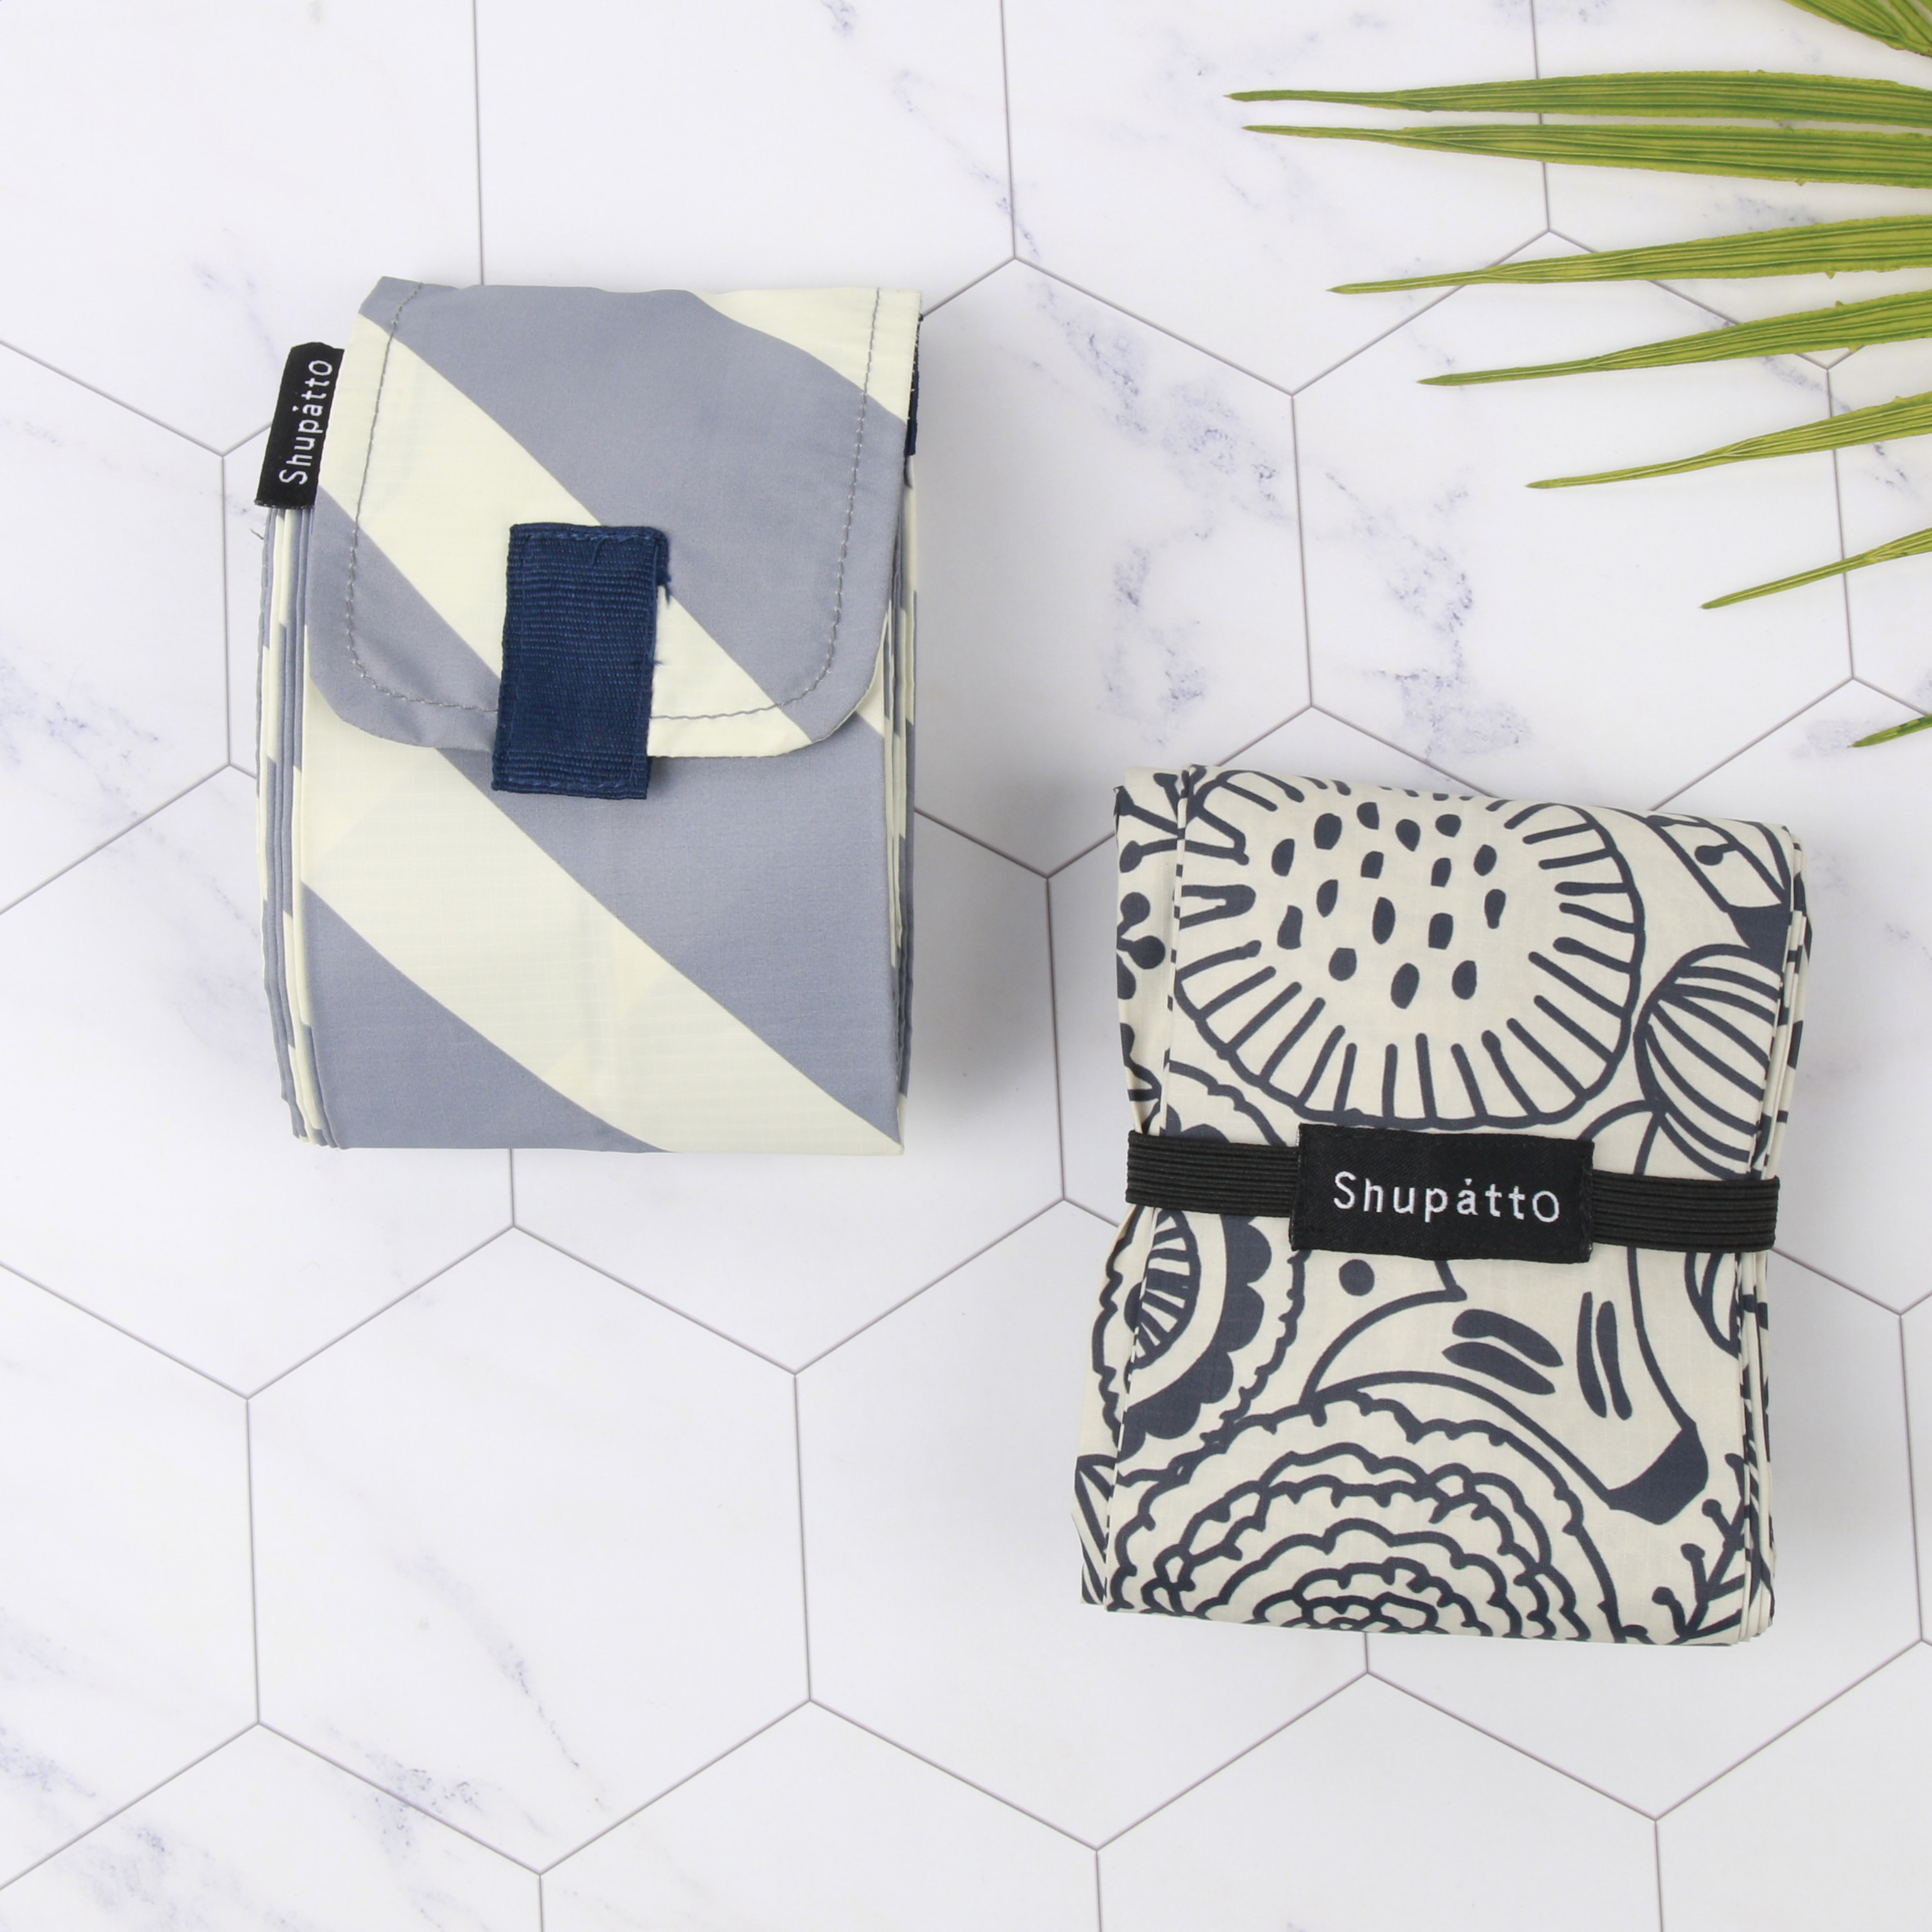 High Qualtiy Reusable Fast Folding Shopping Bag With Good Price